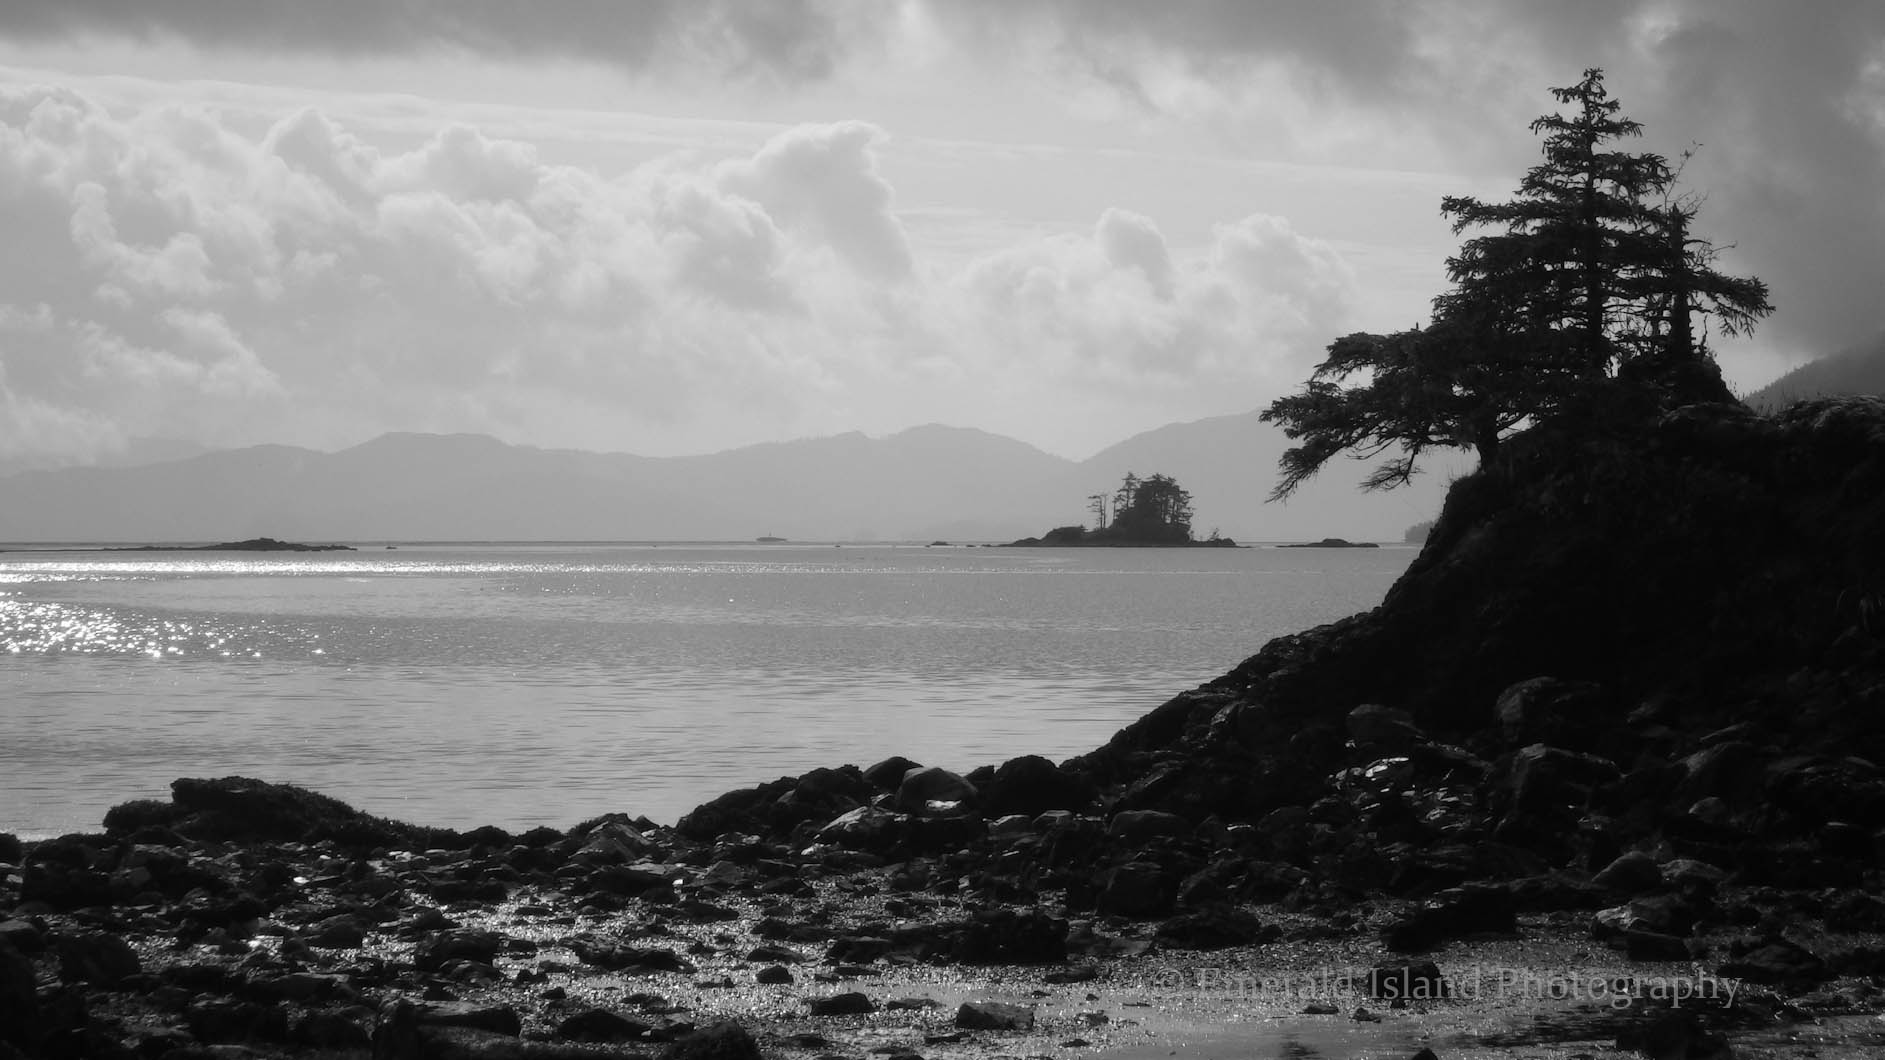 Island Serenity